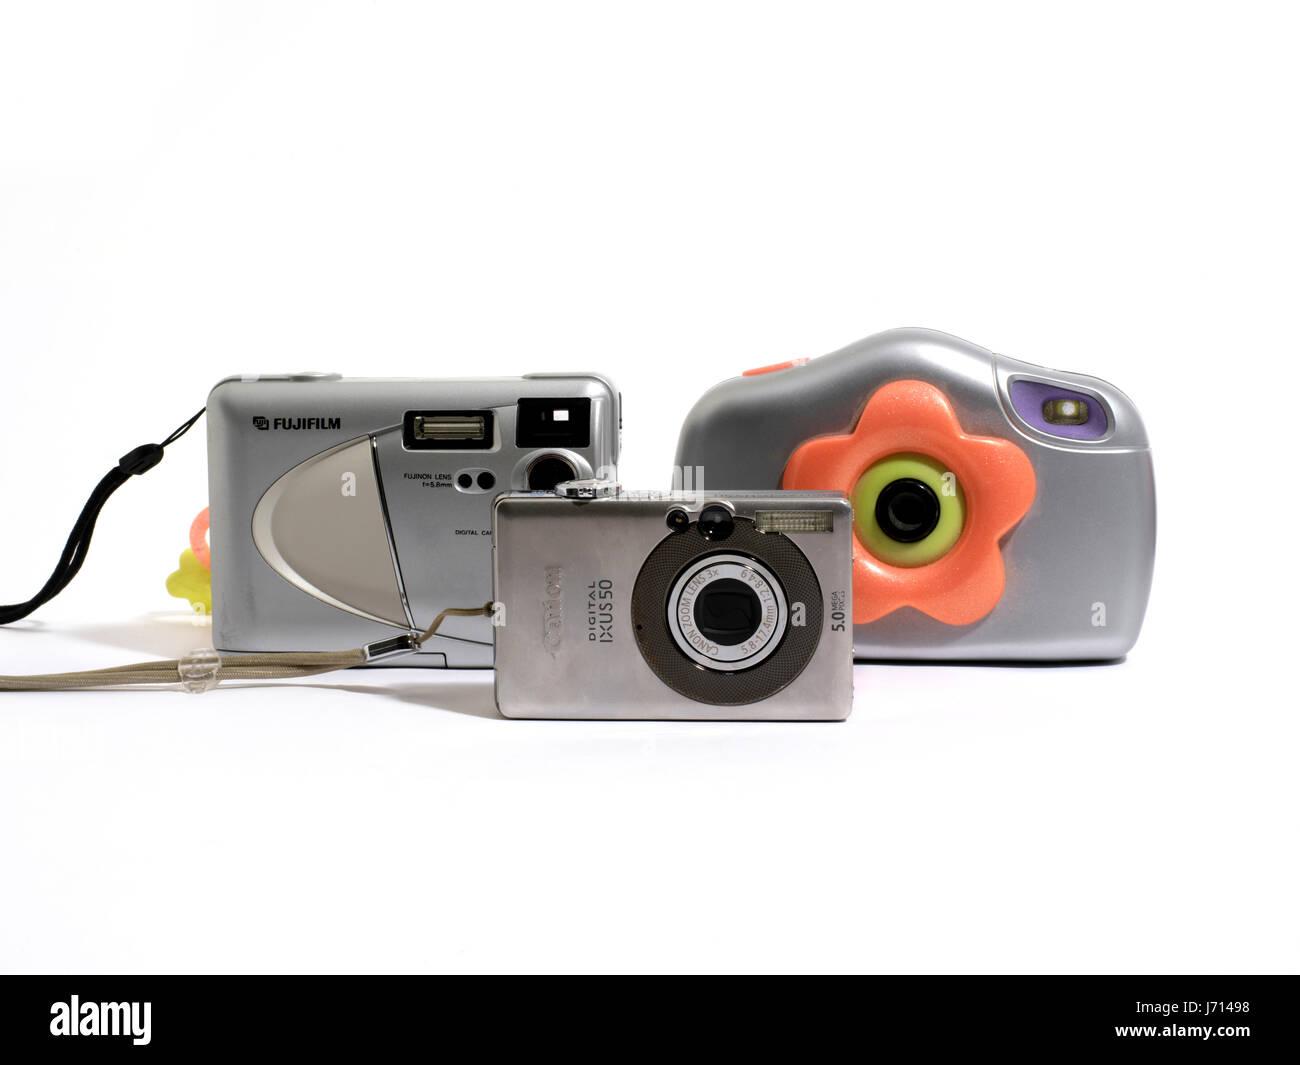 Three Digital Cameras - Fujifilm Finepix 2300, Canon Ixus 50 and Barbie Digital Camera - Stock Image